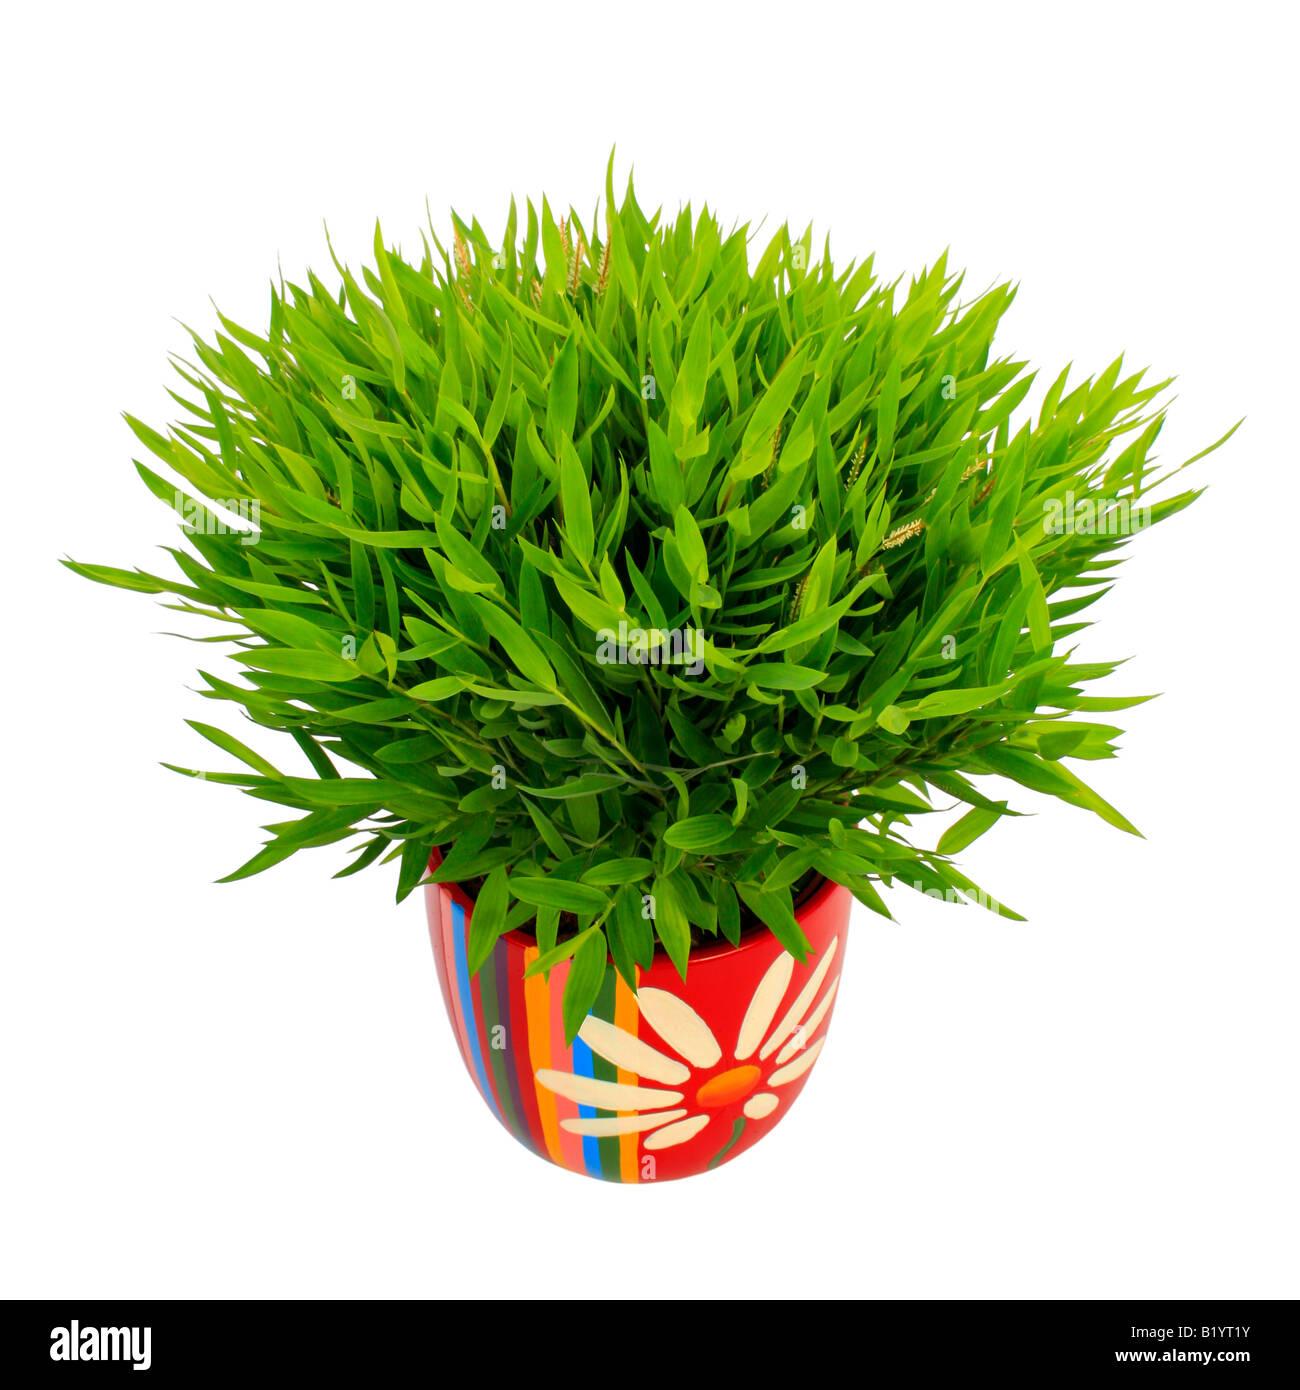 Mini Bamboo Plant : Miniature bamboo pogonatherum paniceum plant in colourful